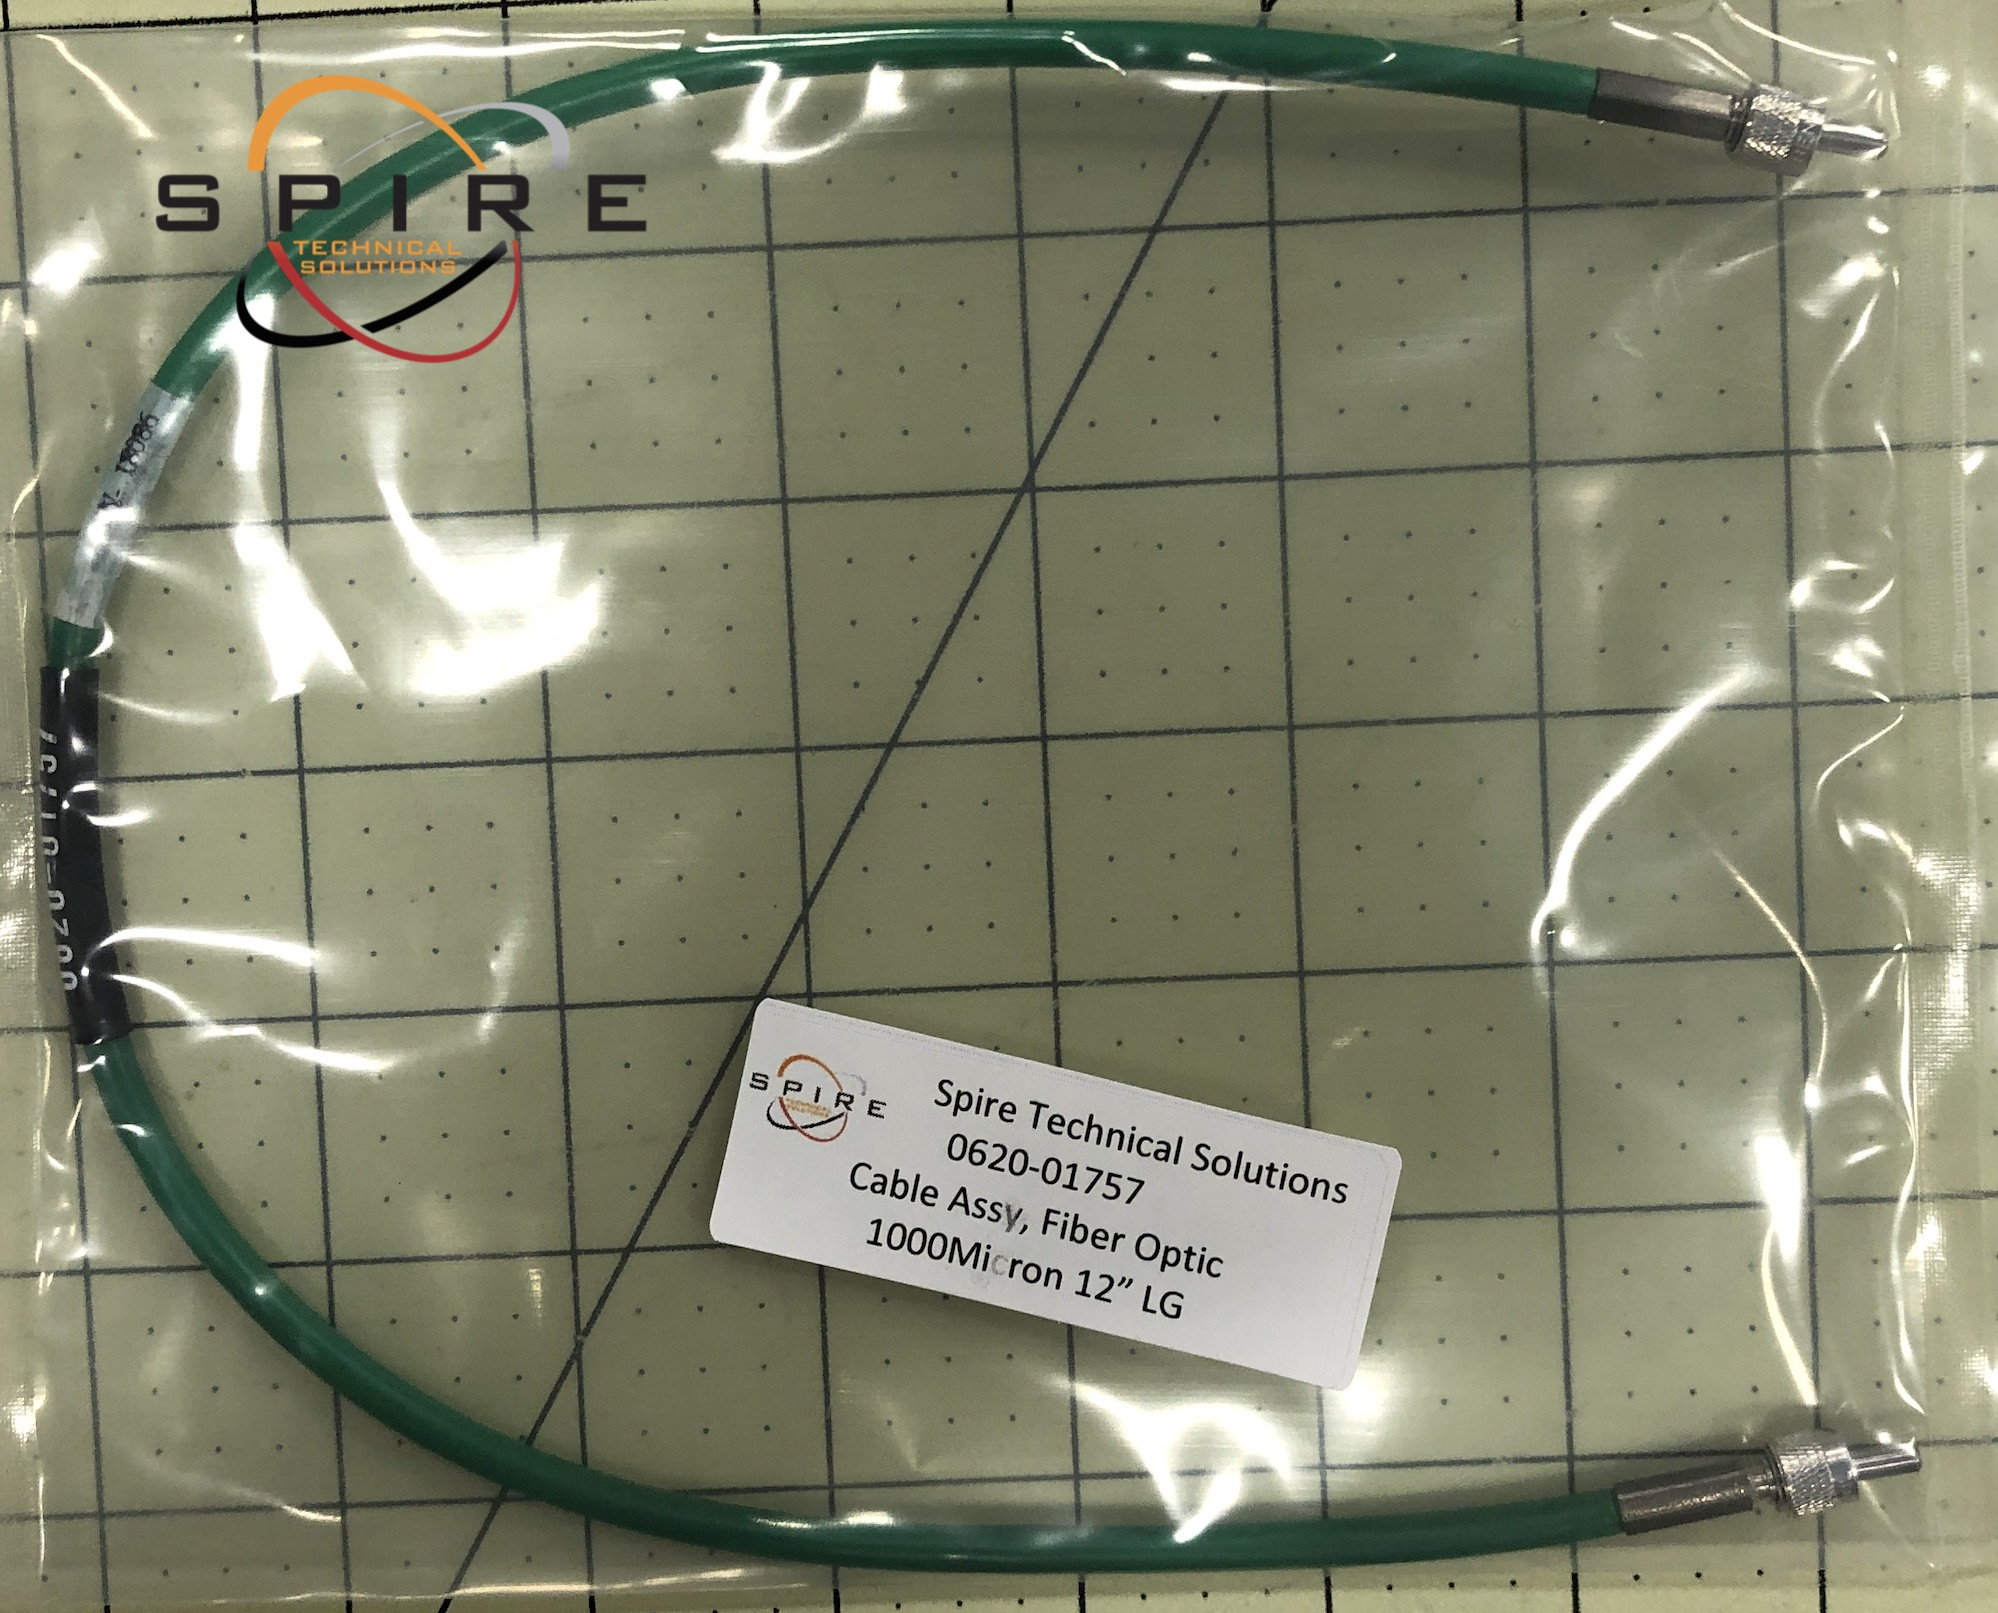 "Cable Assy, Fiber Optic 1000Micron 12"" LG"